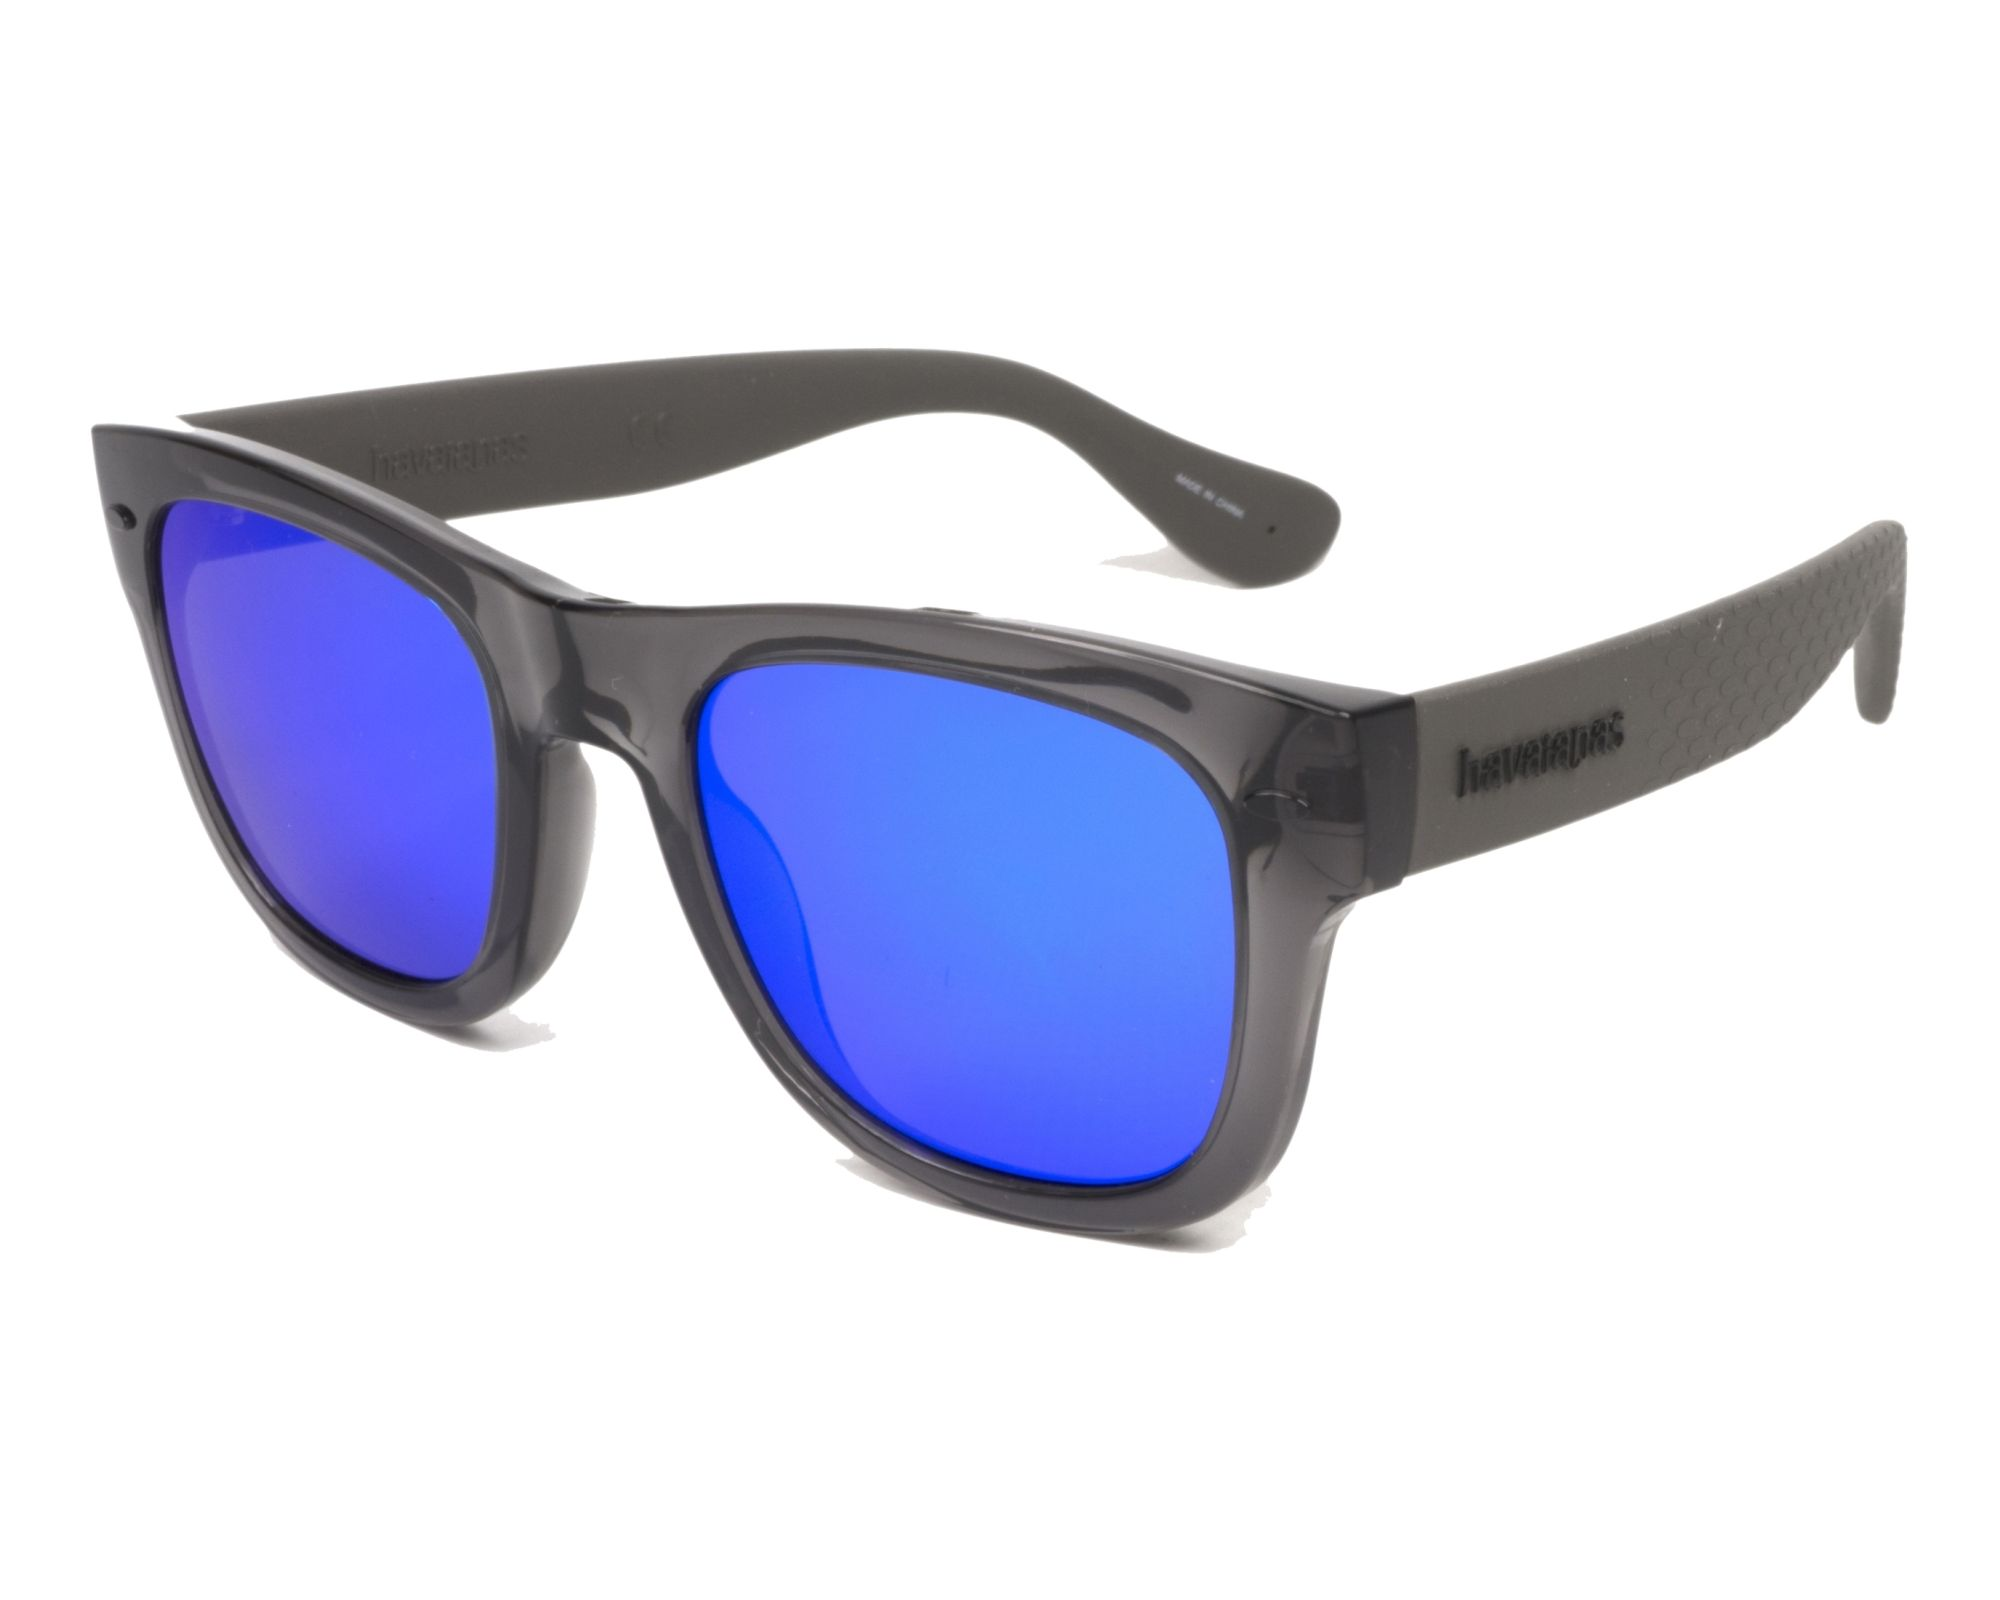 Havaianas Sonnenbrille » PARATY/S«, blau, QMB/Z9 - blau/grün